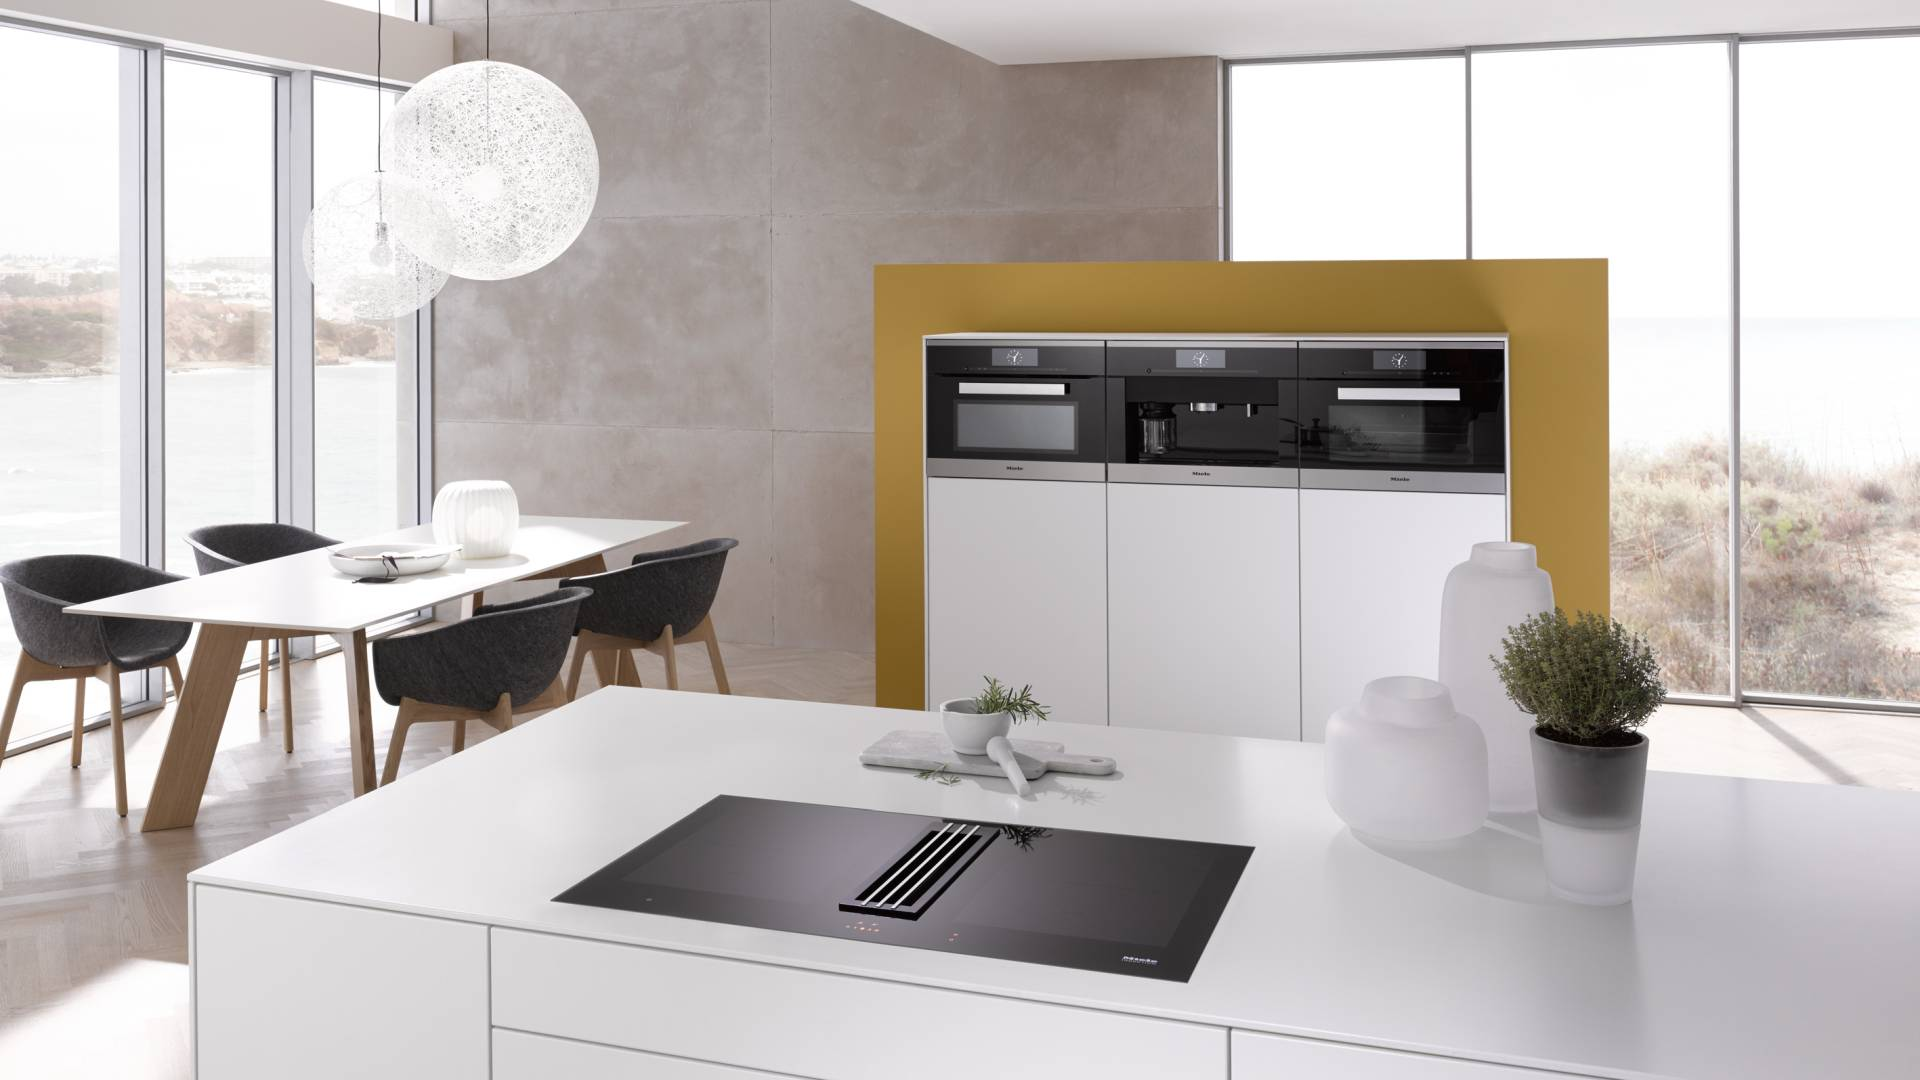 Rempp Küche | Miele Center Markant Dornbirn